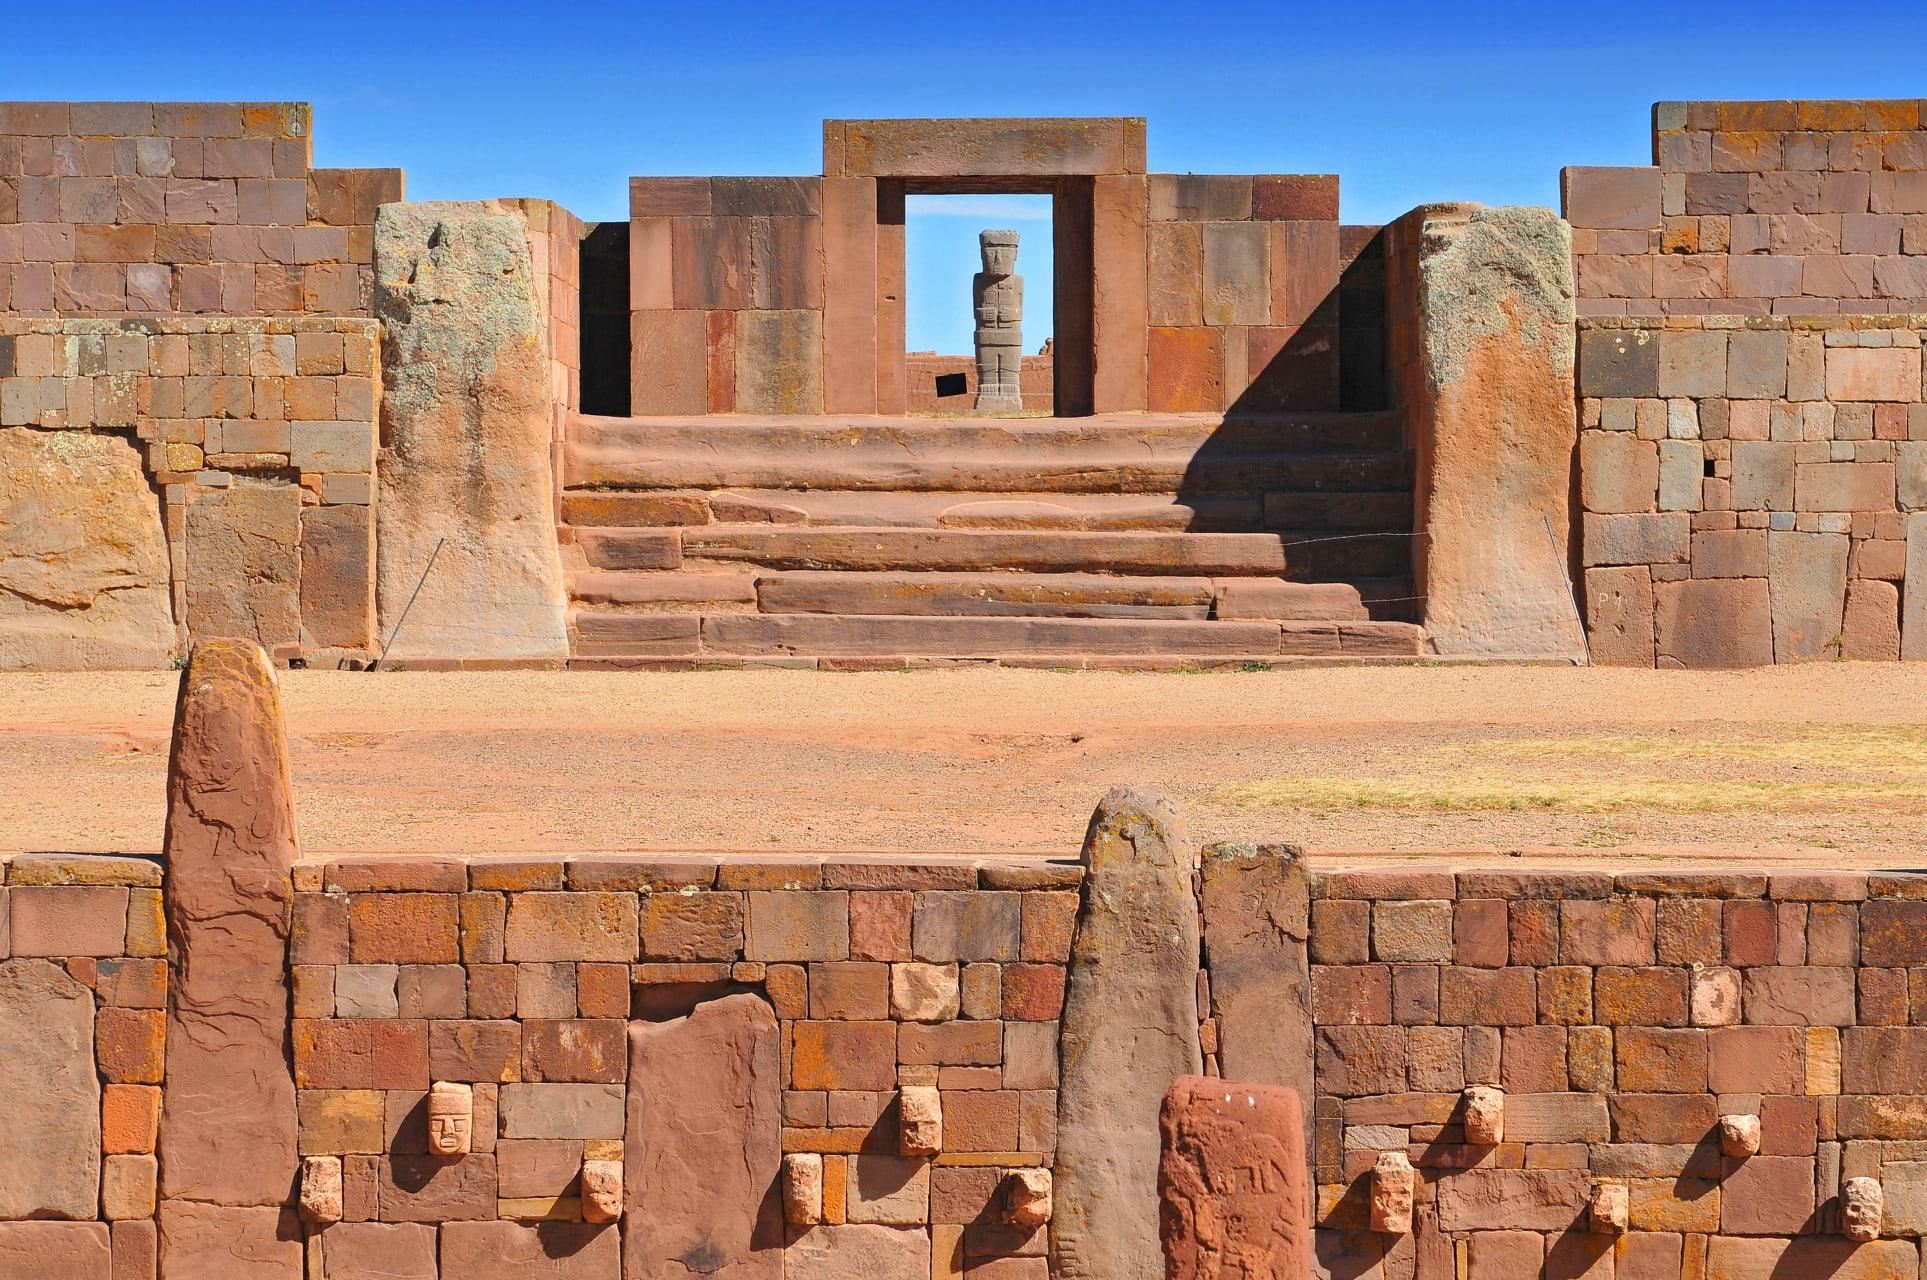 La Paz - The winter solstice in Tiwanaku